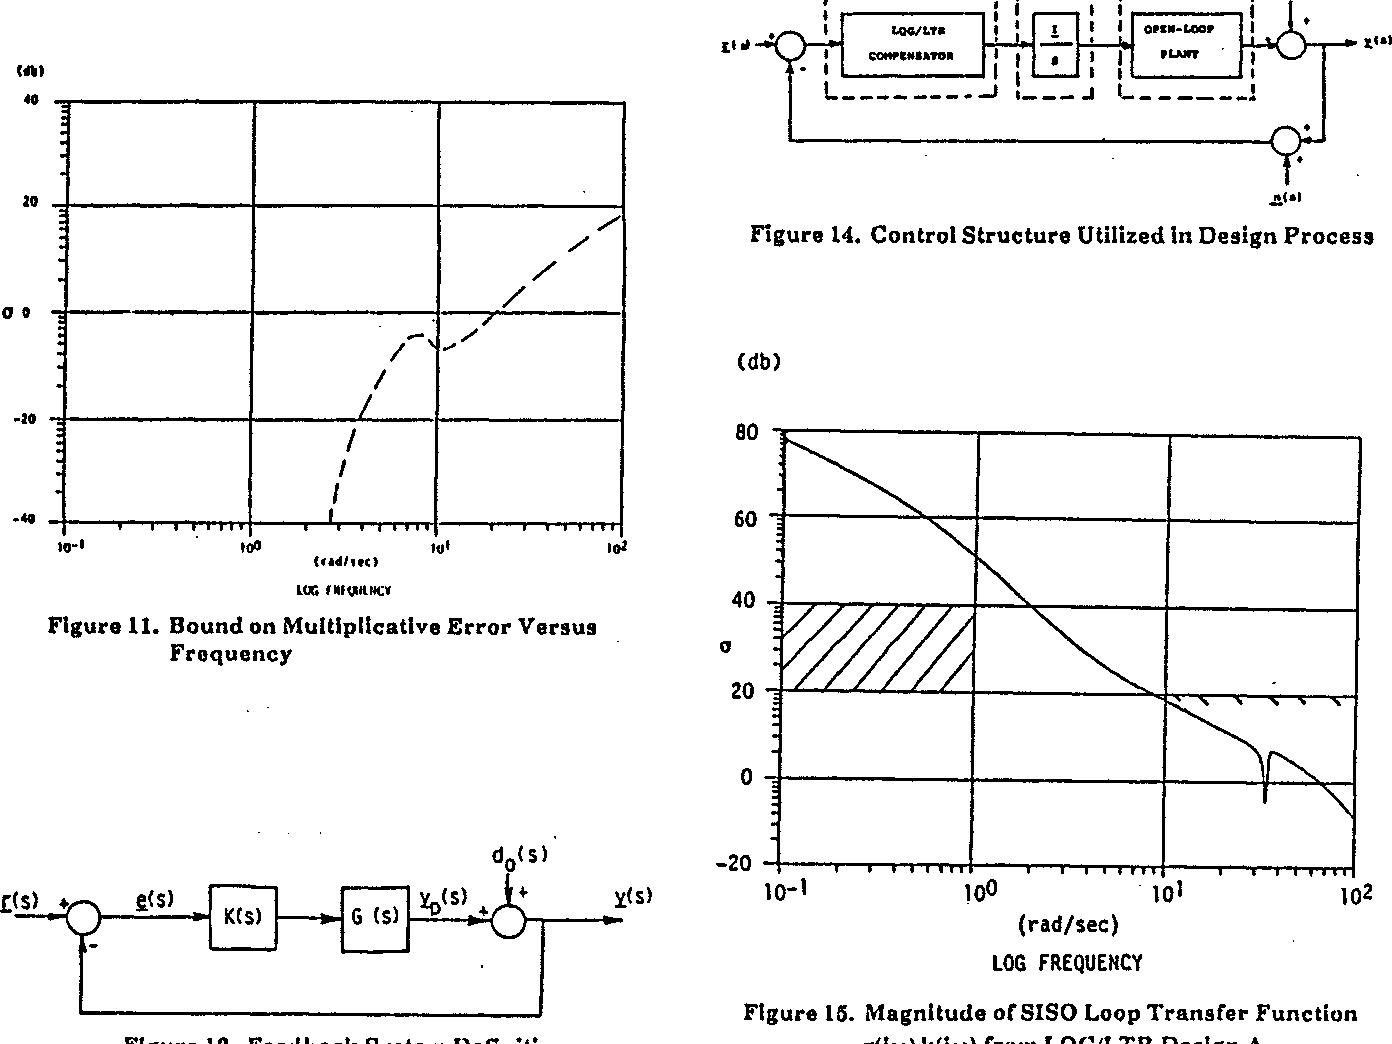 hight resolution of figure 15 magnitude of siso loop transfer function